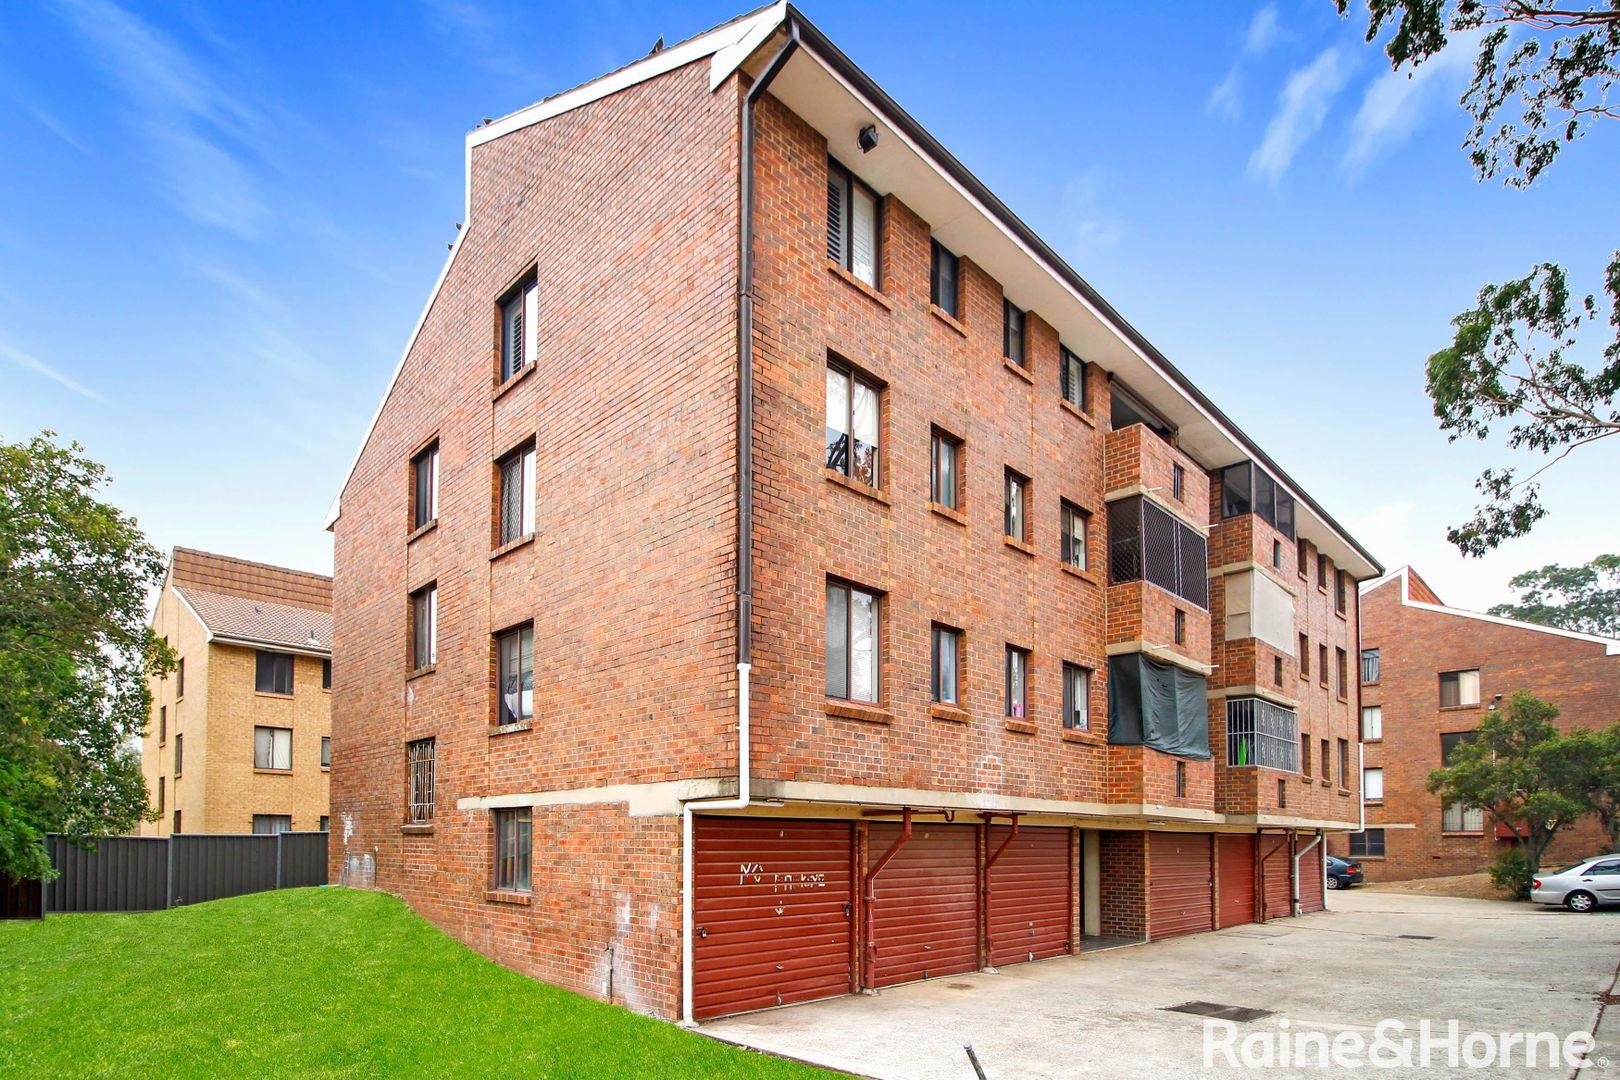 20/342 Woodstock Avenue, Mount Druitt NSW 2770, Image 0